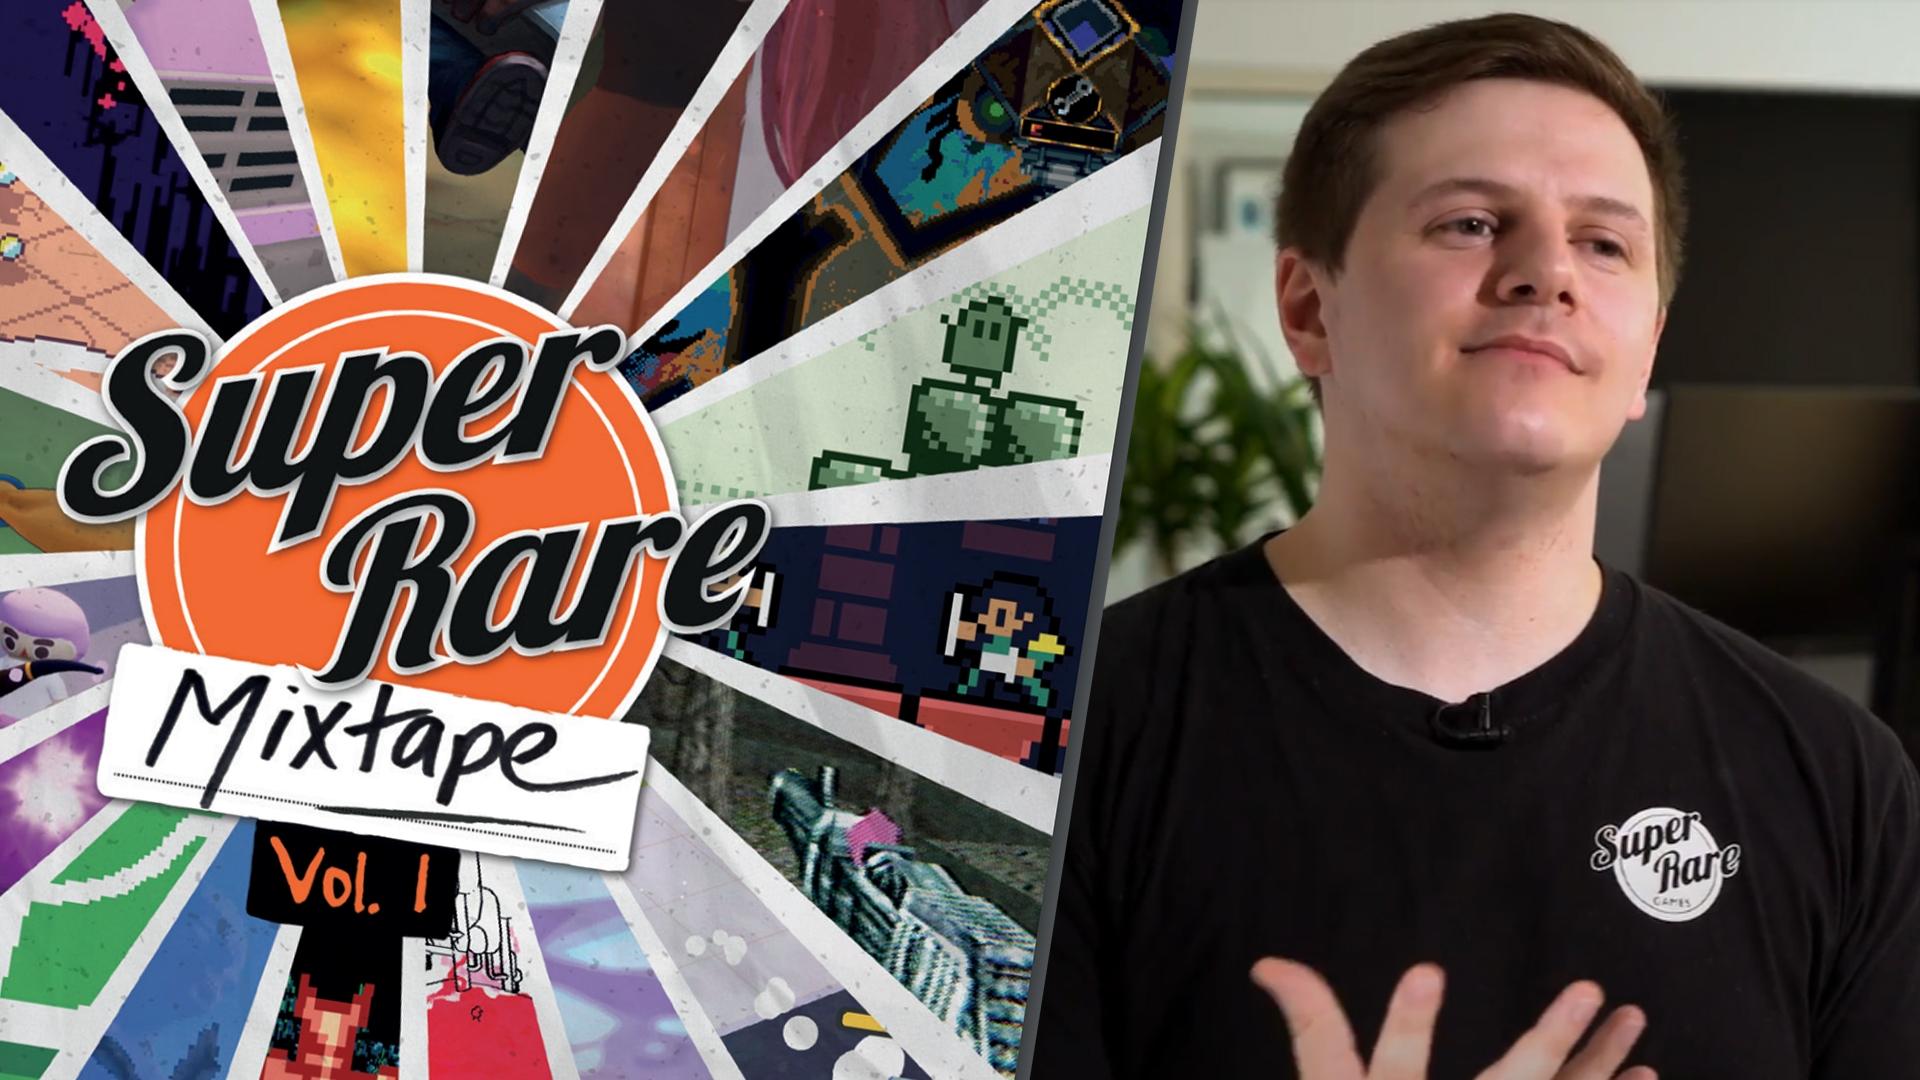 Suepr Rare Mixtape interview. Ryan Brown talks to us about the Super Rare Mixtape.